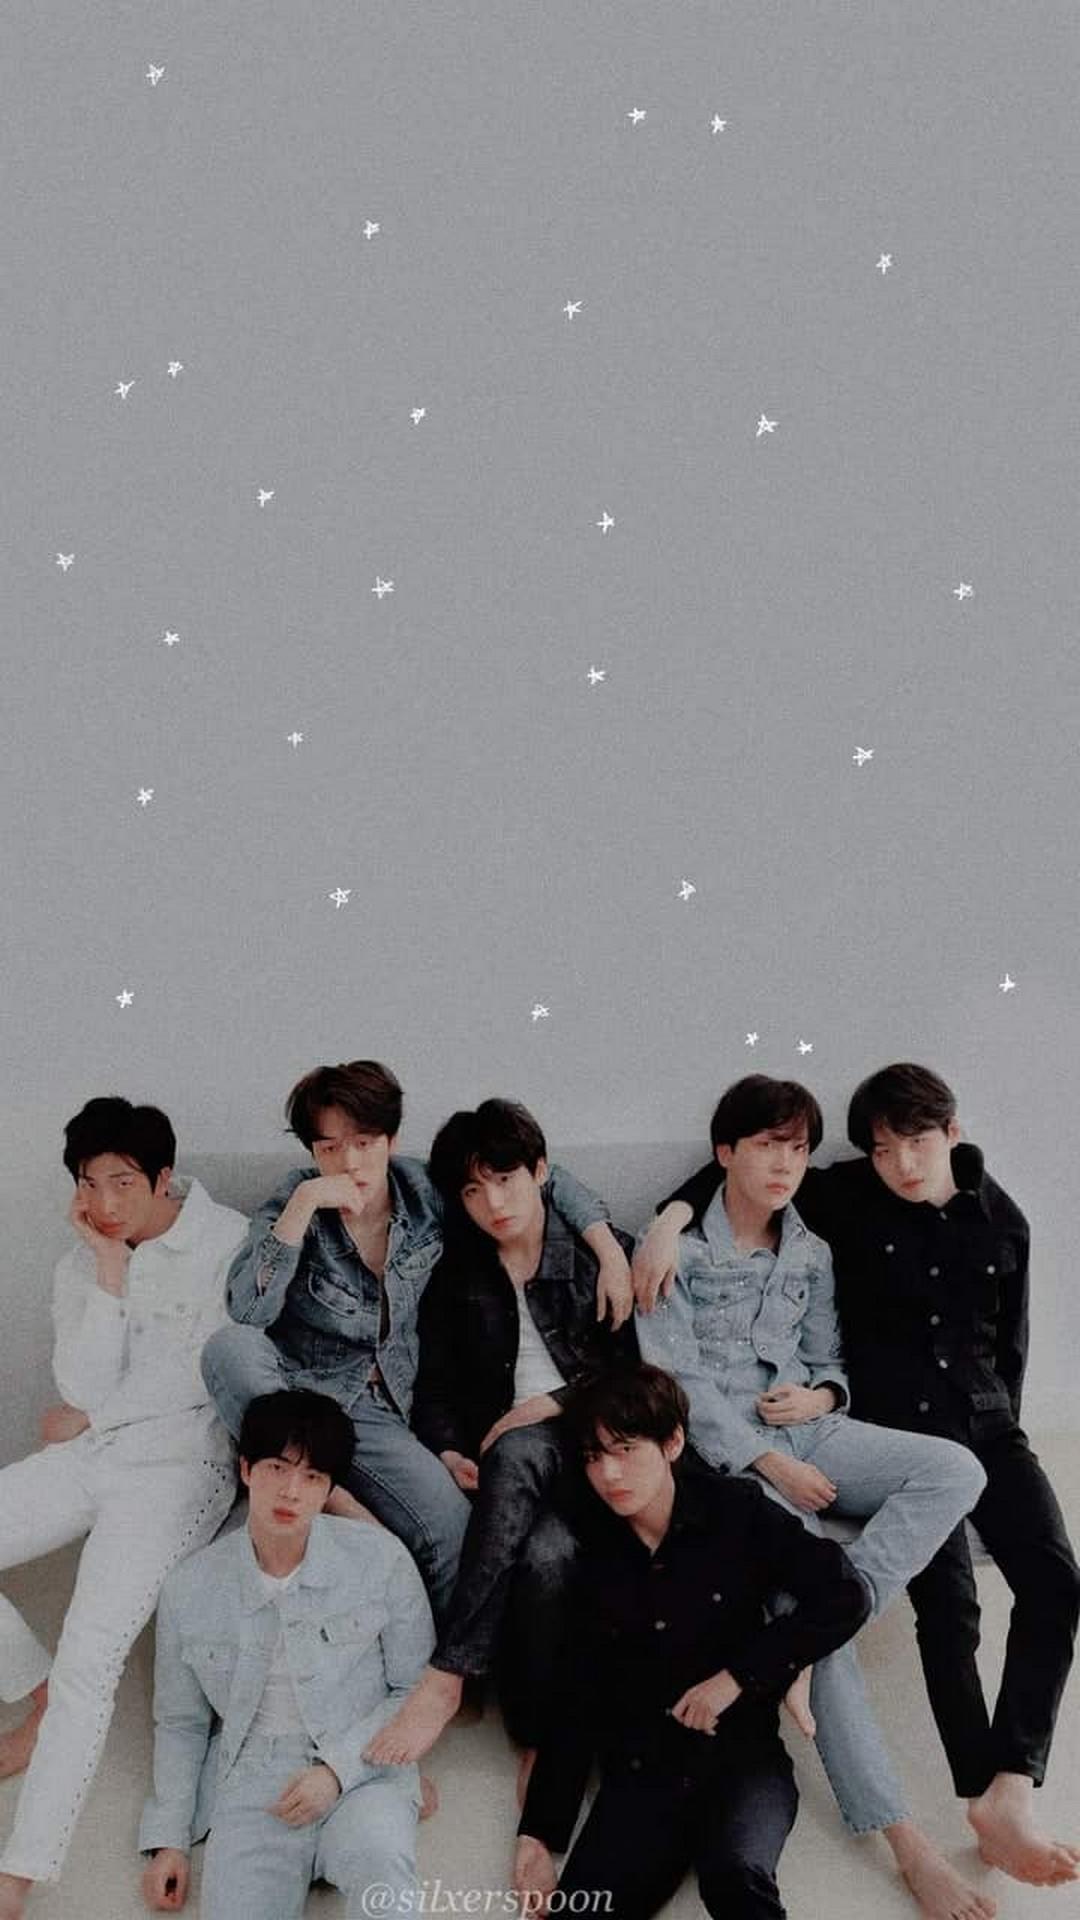 BTS Wallpaper For Phone 2019 Live Wallpaper HD